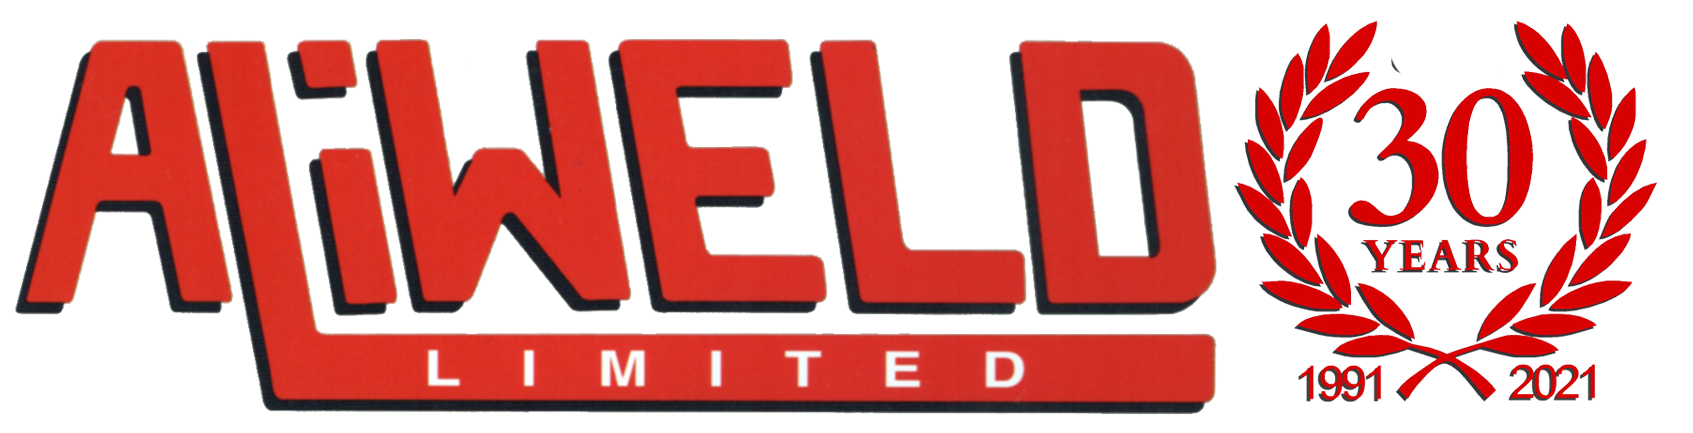 Aliweld Ltd